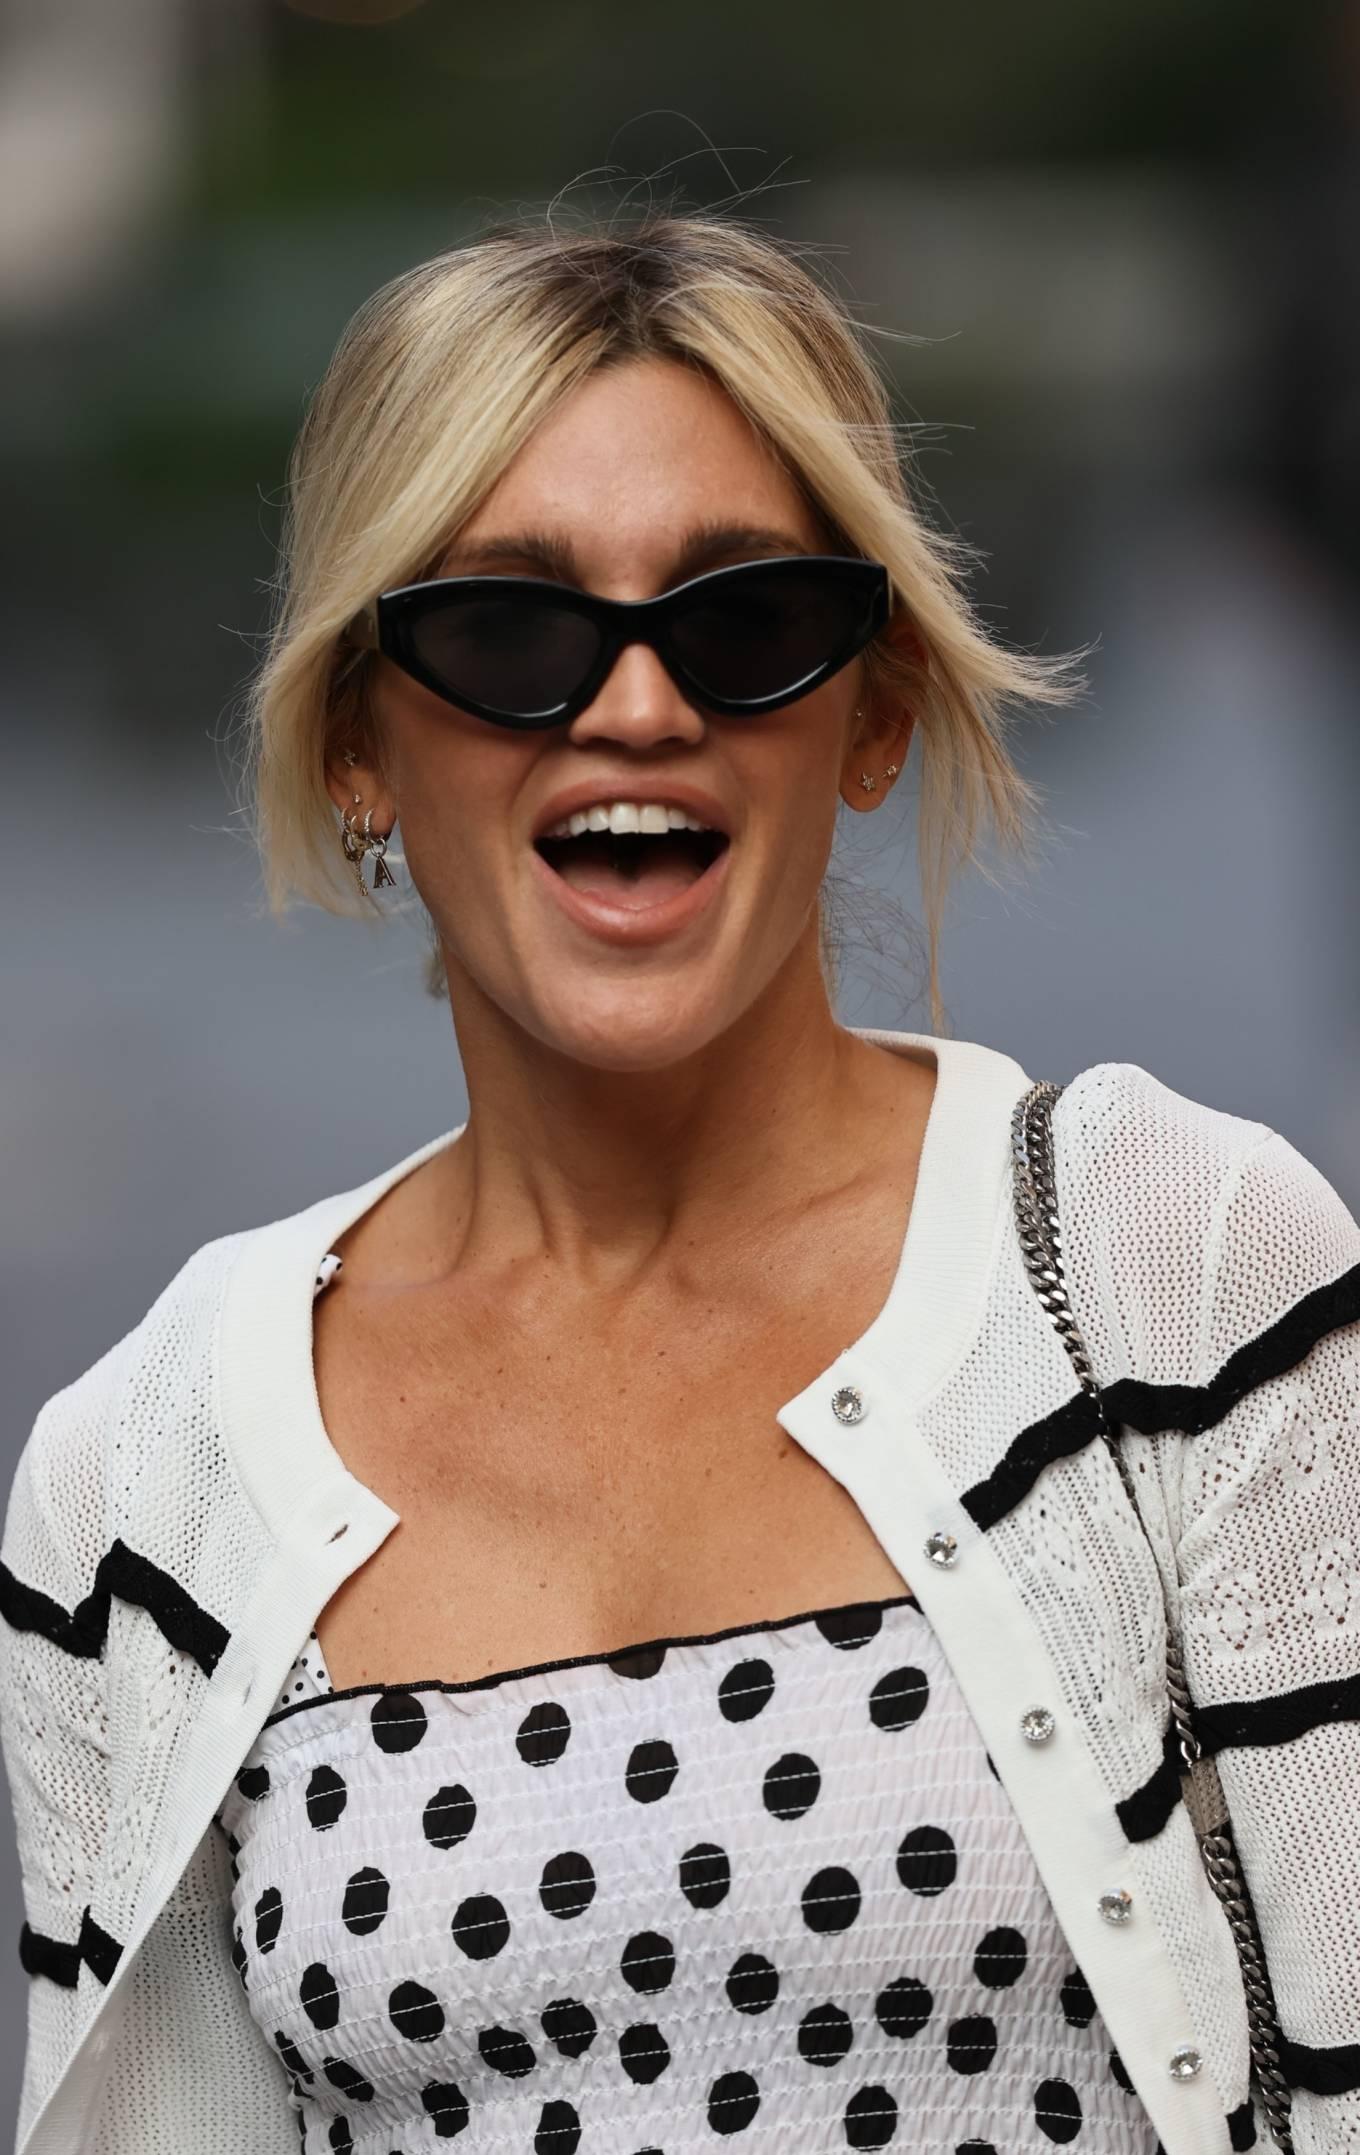 Ashley Roberts 2020 : Ashley Roberts – Wears White Polka Dot dress in London-10